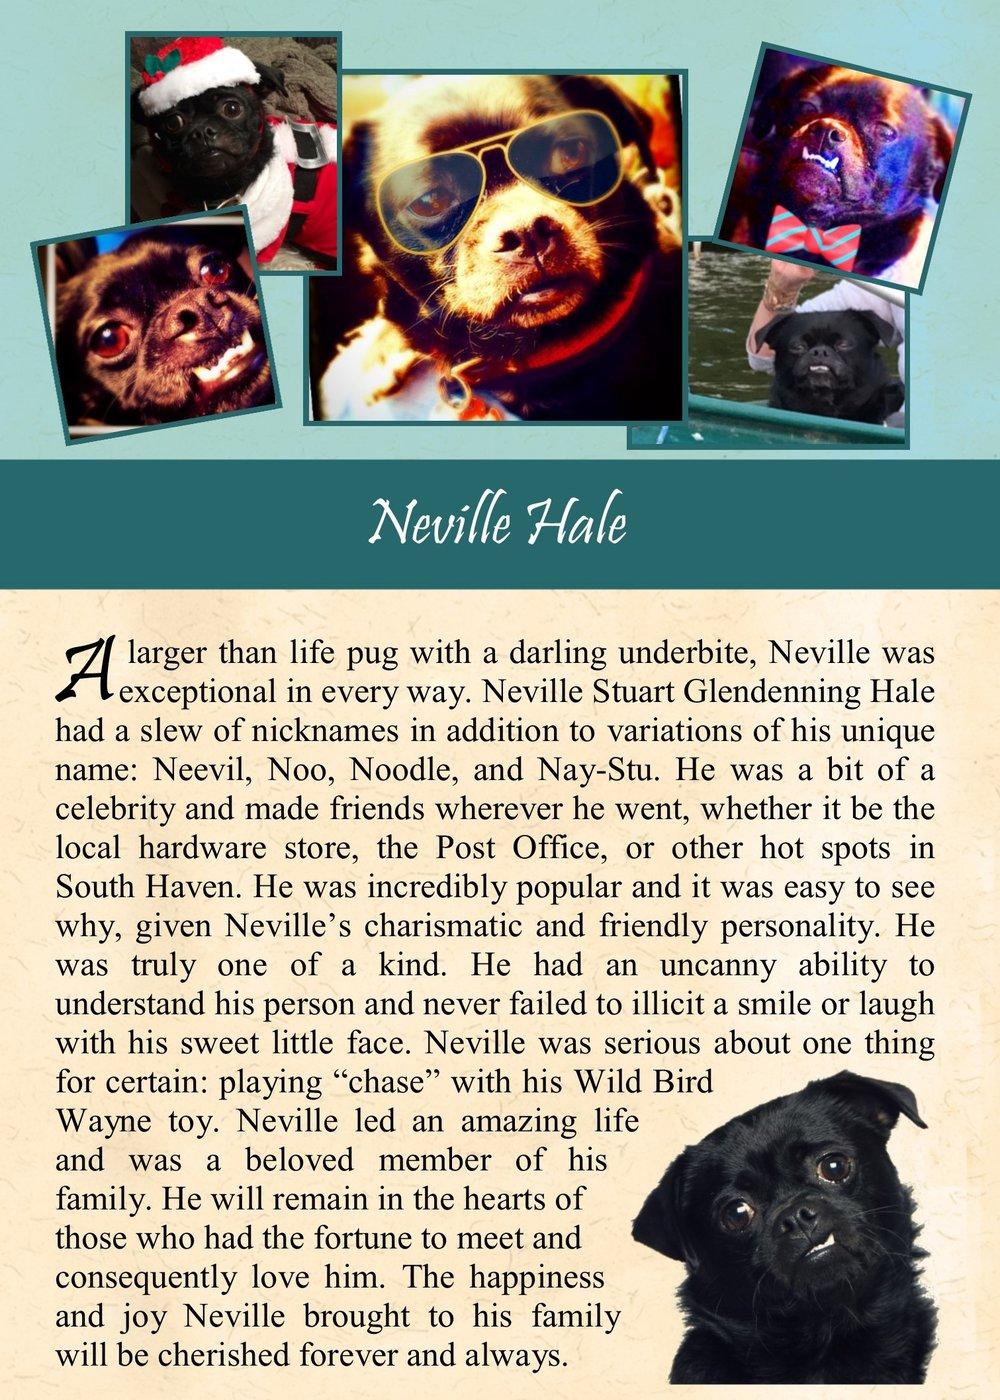 Neville Hale 2017-11-13.jpg